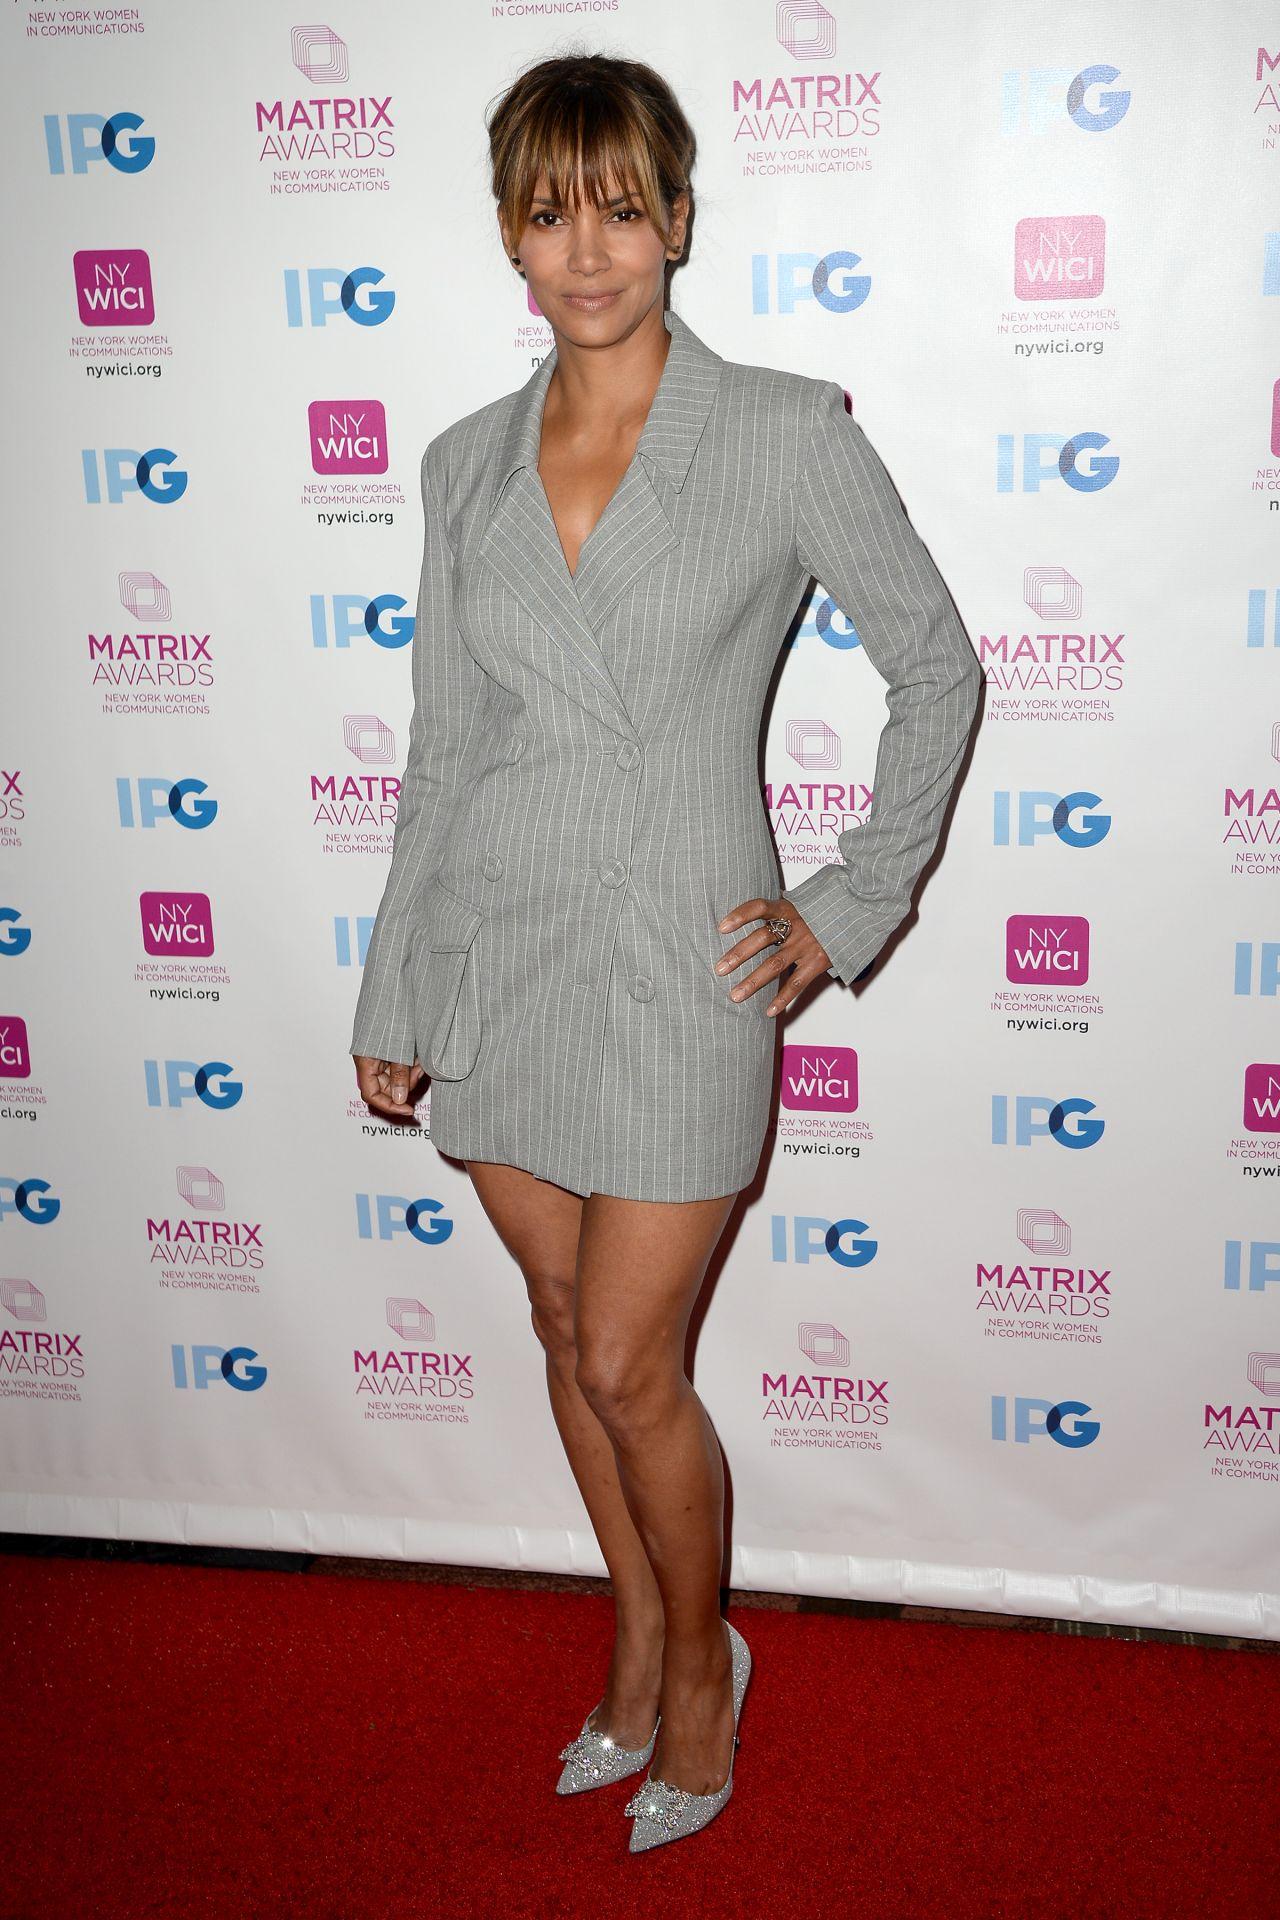 b2360ad1d8d Halle Berry - New York Women In Communication Matrix Awards 2018